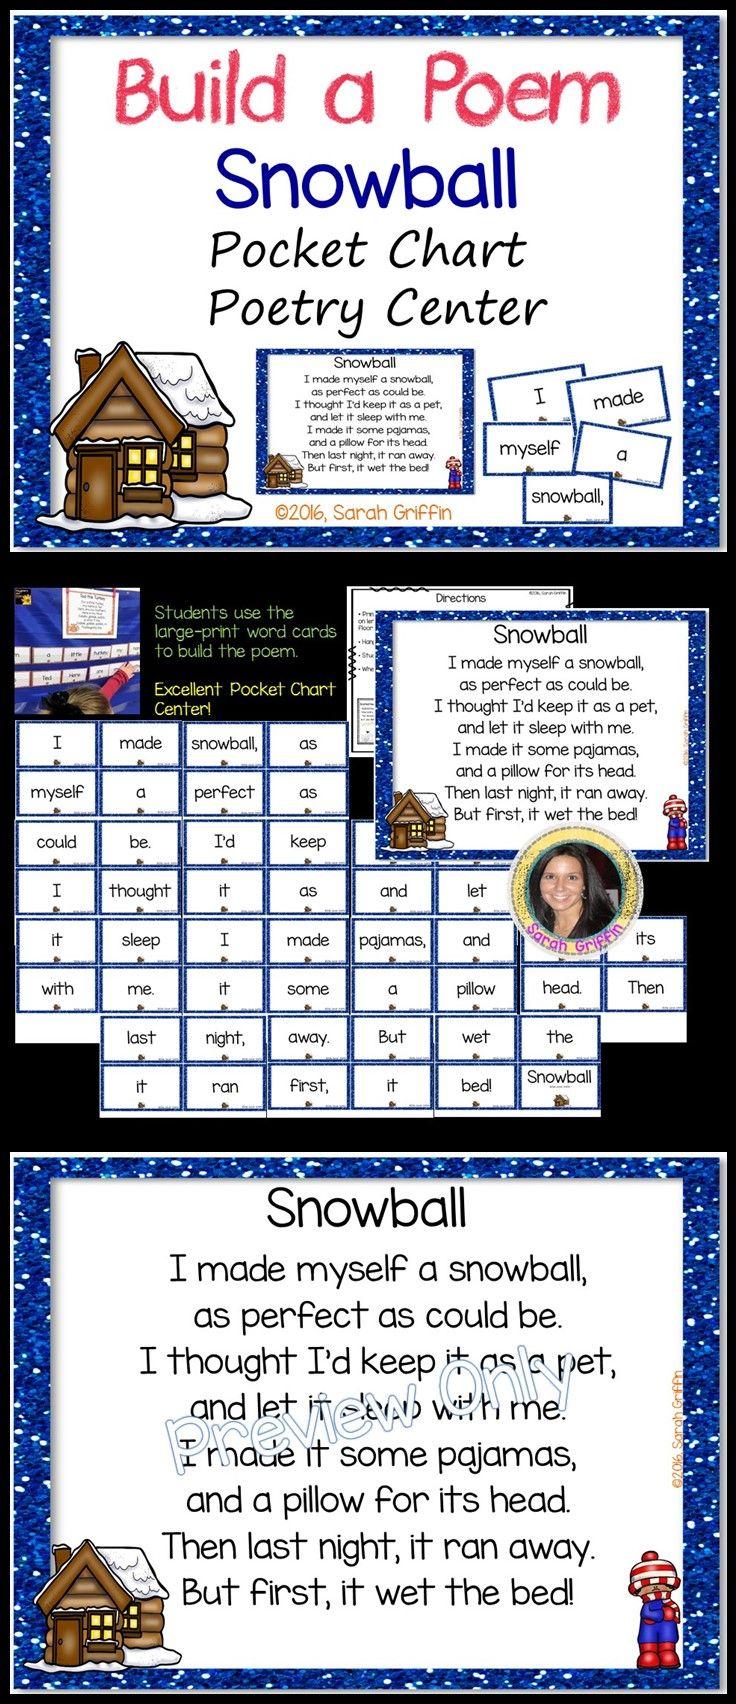 Snowball | Winter Poem for Kids | Build a Poem | Pocket chart center | poetry center | funny poems for kids